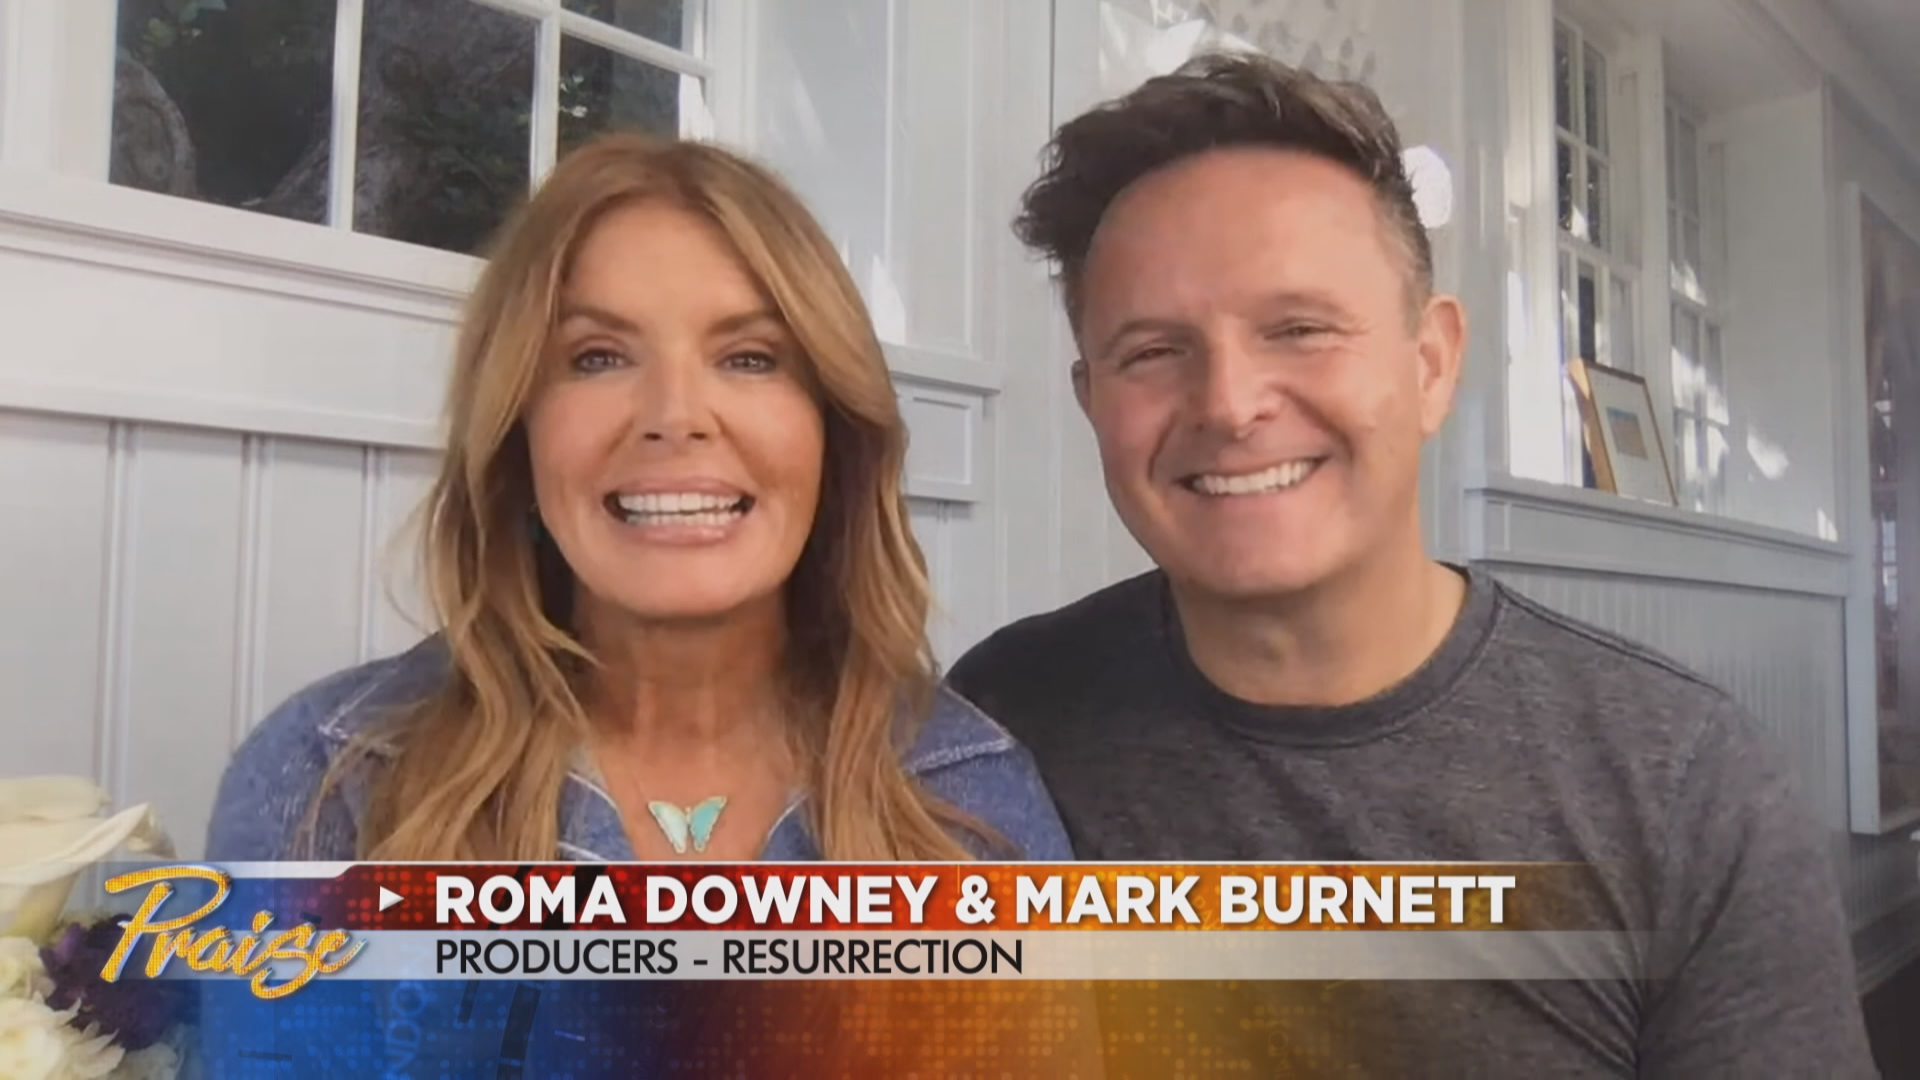 Praise | Mark Burnett and Roma Downey | March 24, 2021